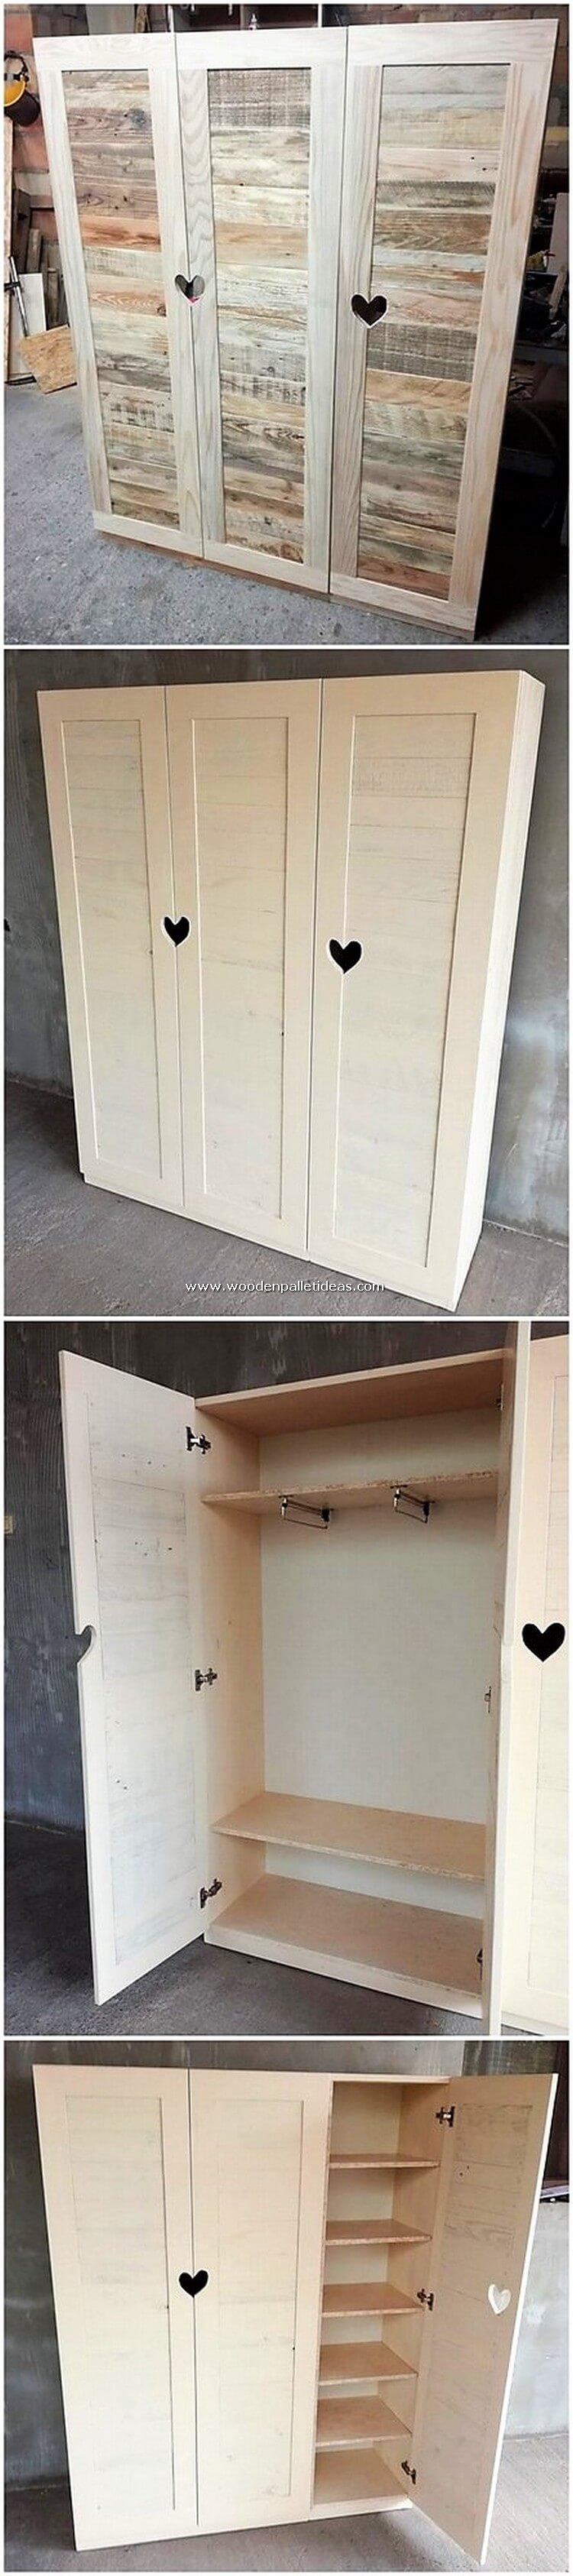 Pallet-Closet-or-Cabinet